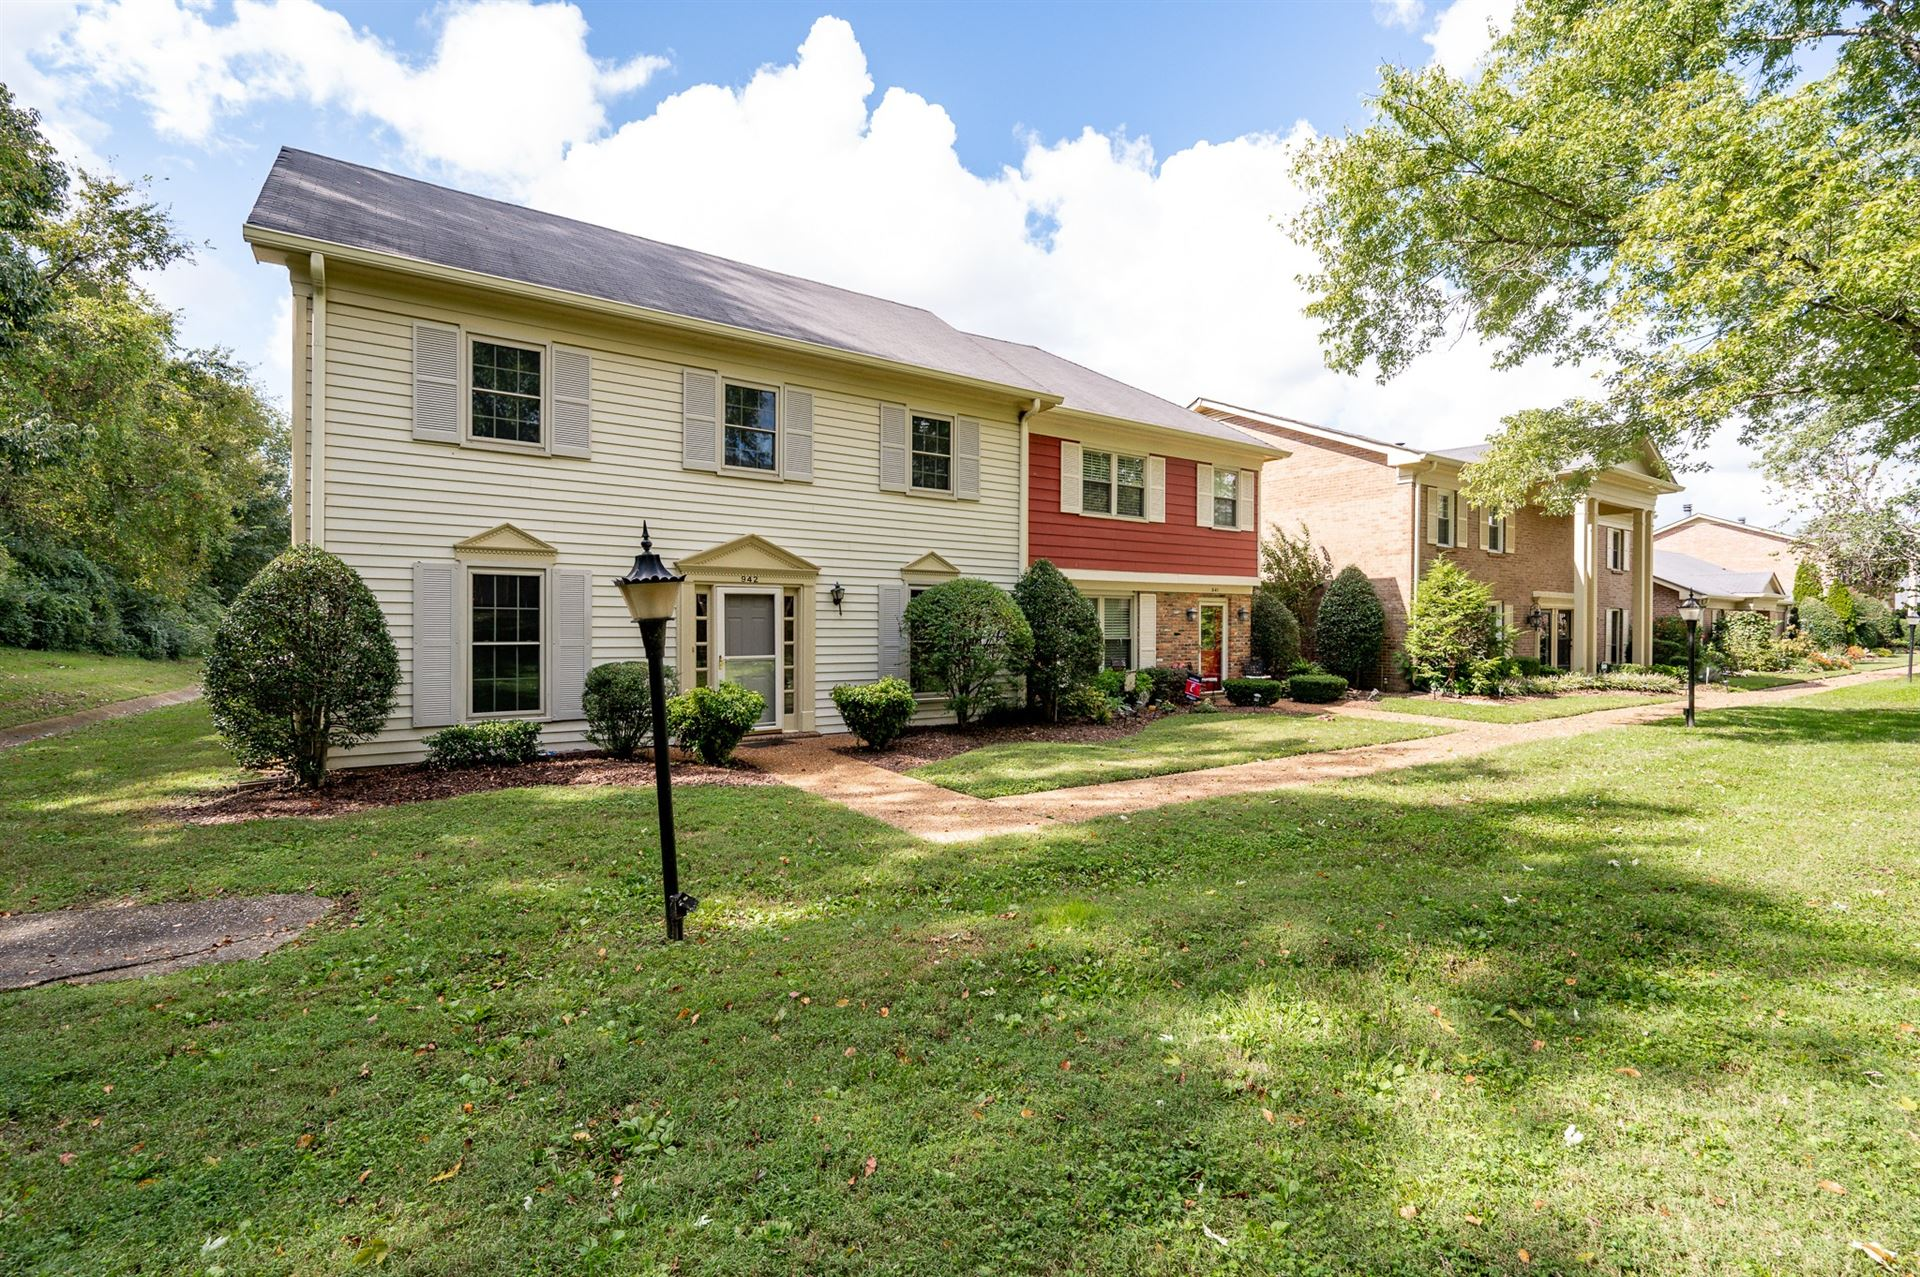 942 General George Patton Rd, Nashville, TN 37221 - MLS#: 2298830